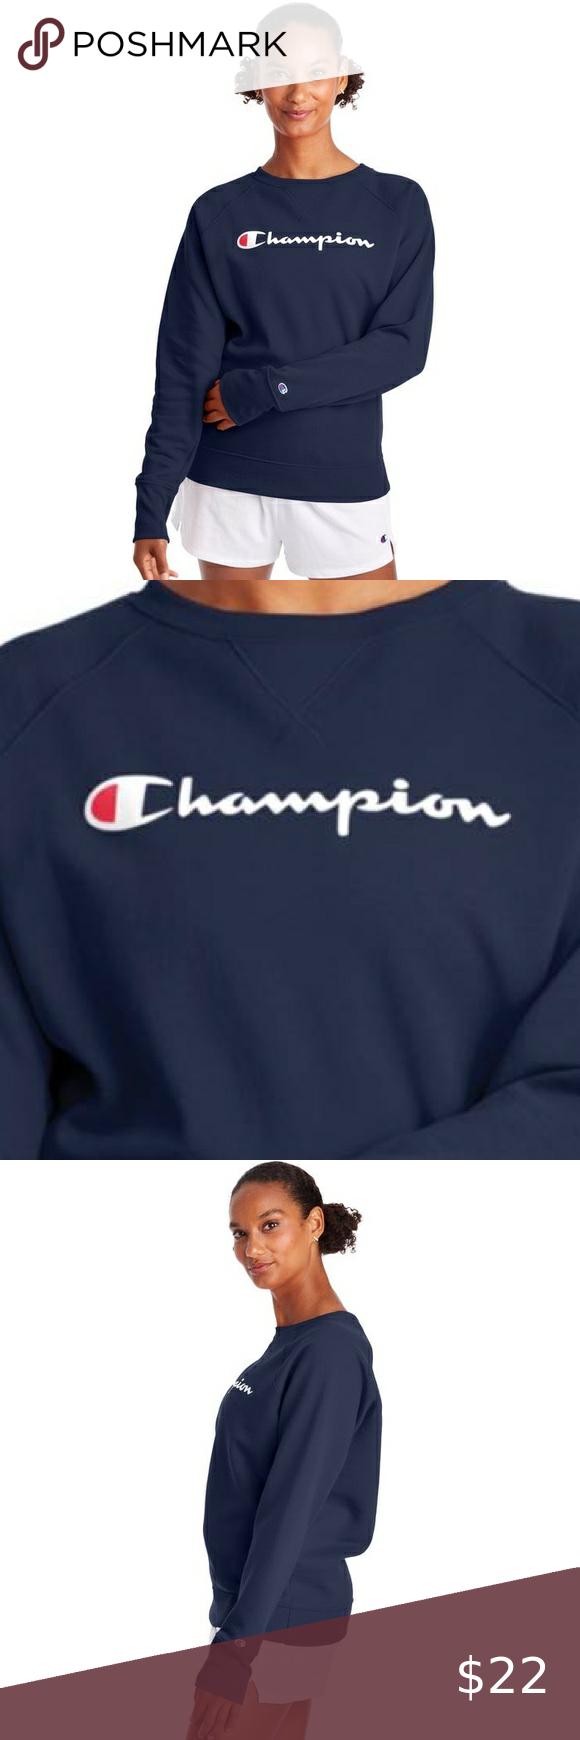 Champion Navy Blue Crew Neck Sweatshirt Size S Crew Neck Sweatshirt Blue Crew Sweatshirts [ 1740 x 580 Pixel ]